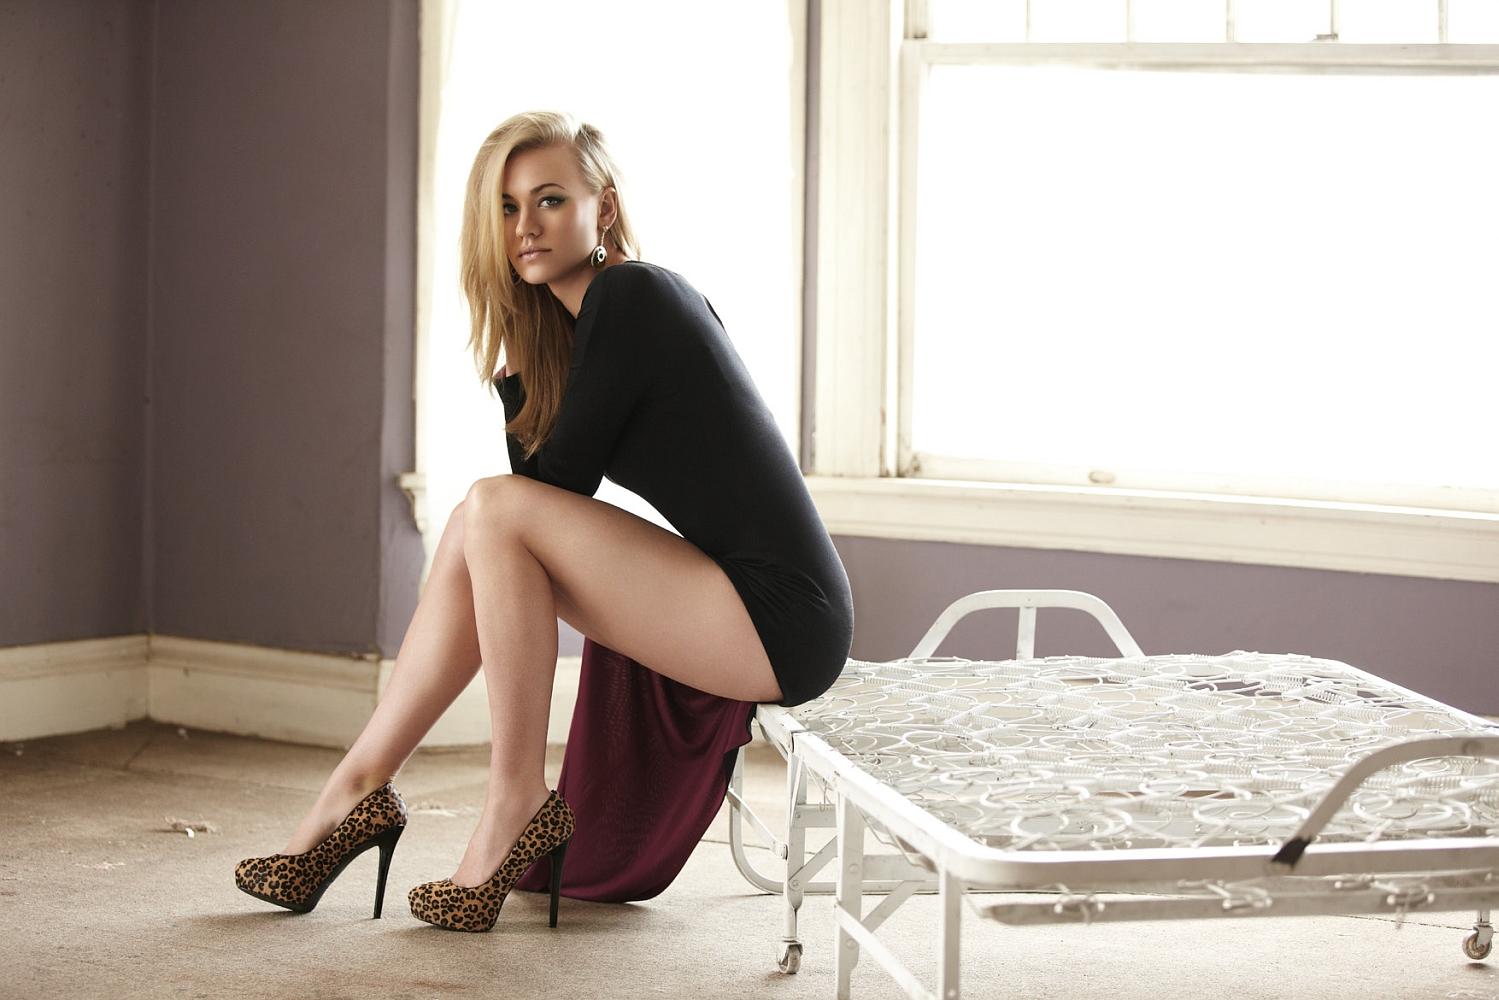 Yvonne Strahovski legs in high heels 1499x1000